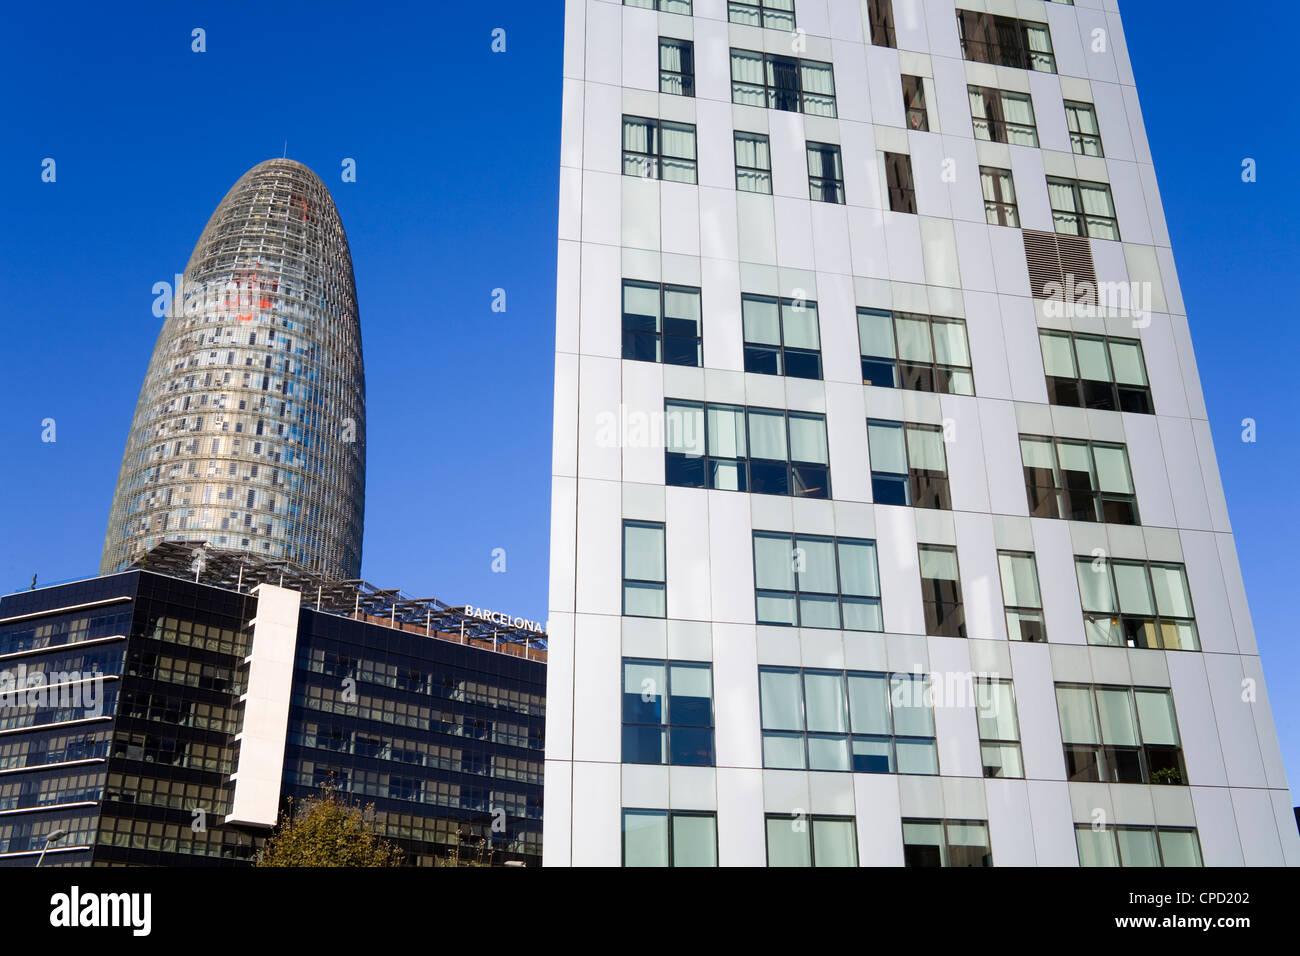 Torre Agbar skyscraper and Novotel Hotel on Avenue Diagonal, Barcelona, Catalonia, Spain, Europe - Stock Image